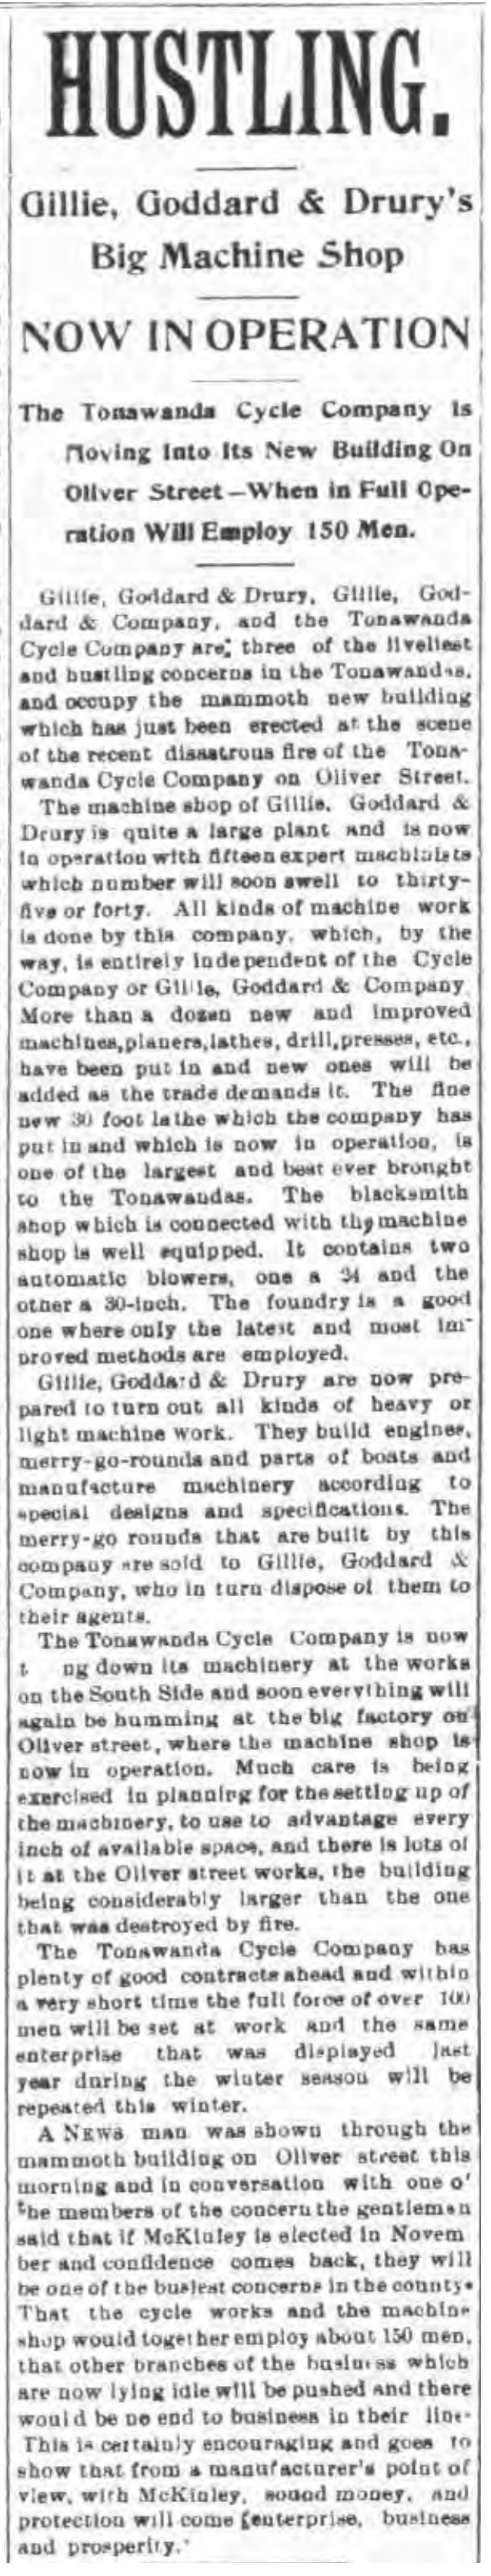 Hustling, Gillie Goddard and Drurys Big Machine Shop, article (Tonawanda News, 1896-10-15).jpg